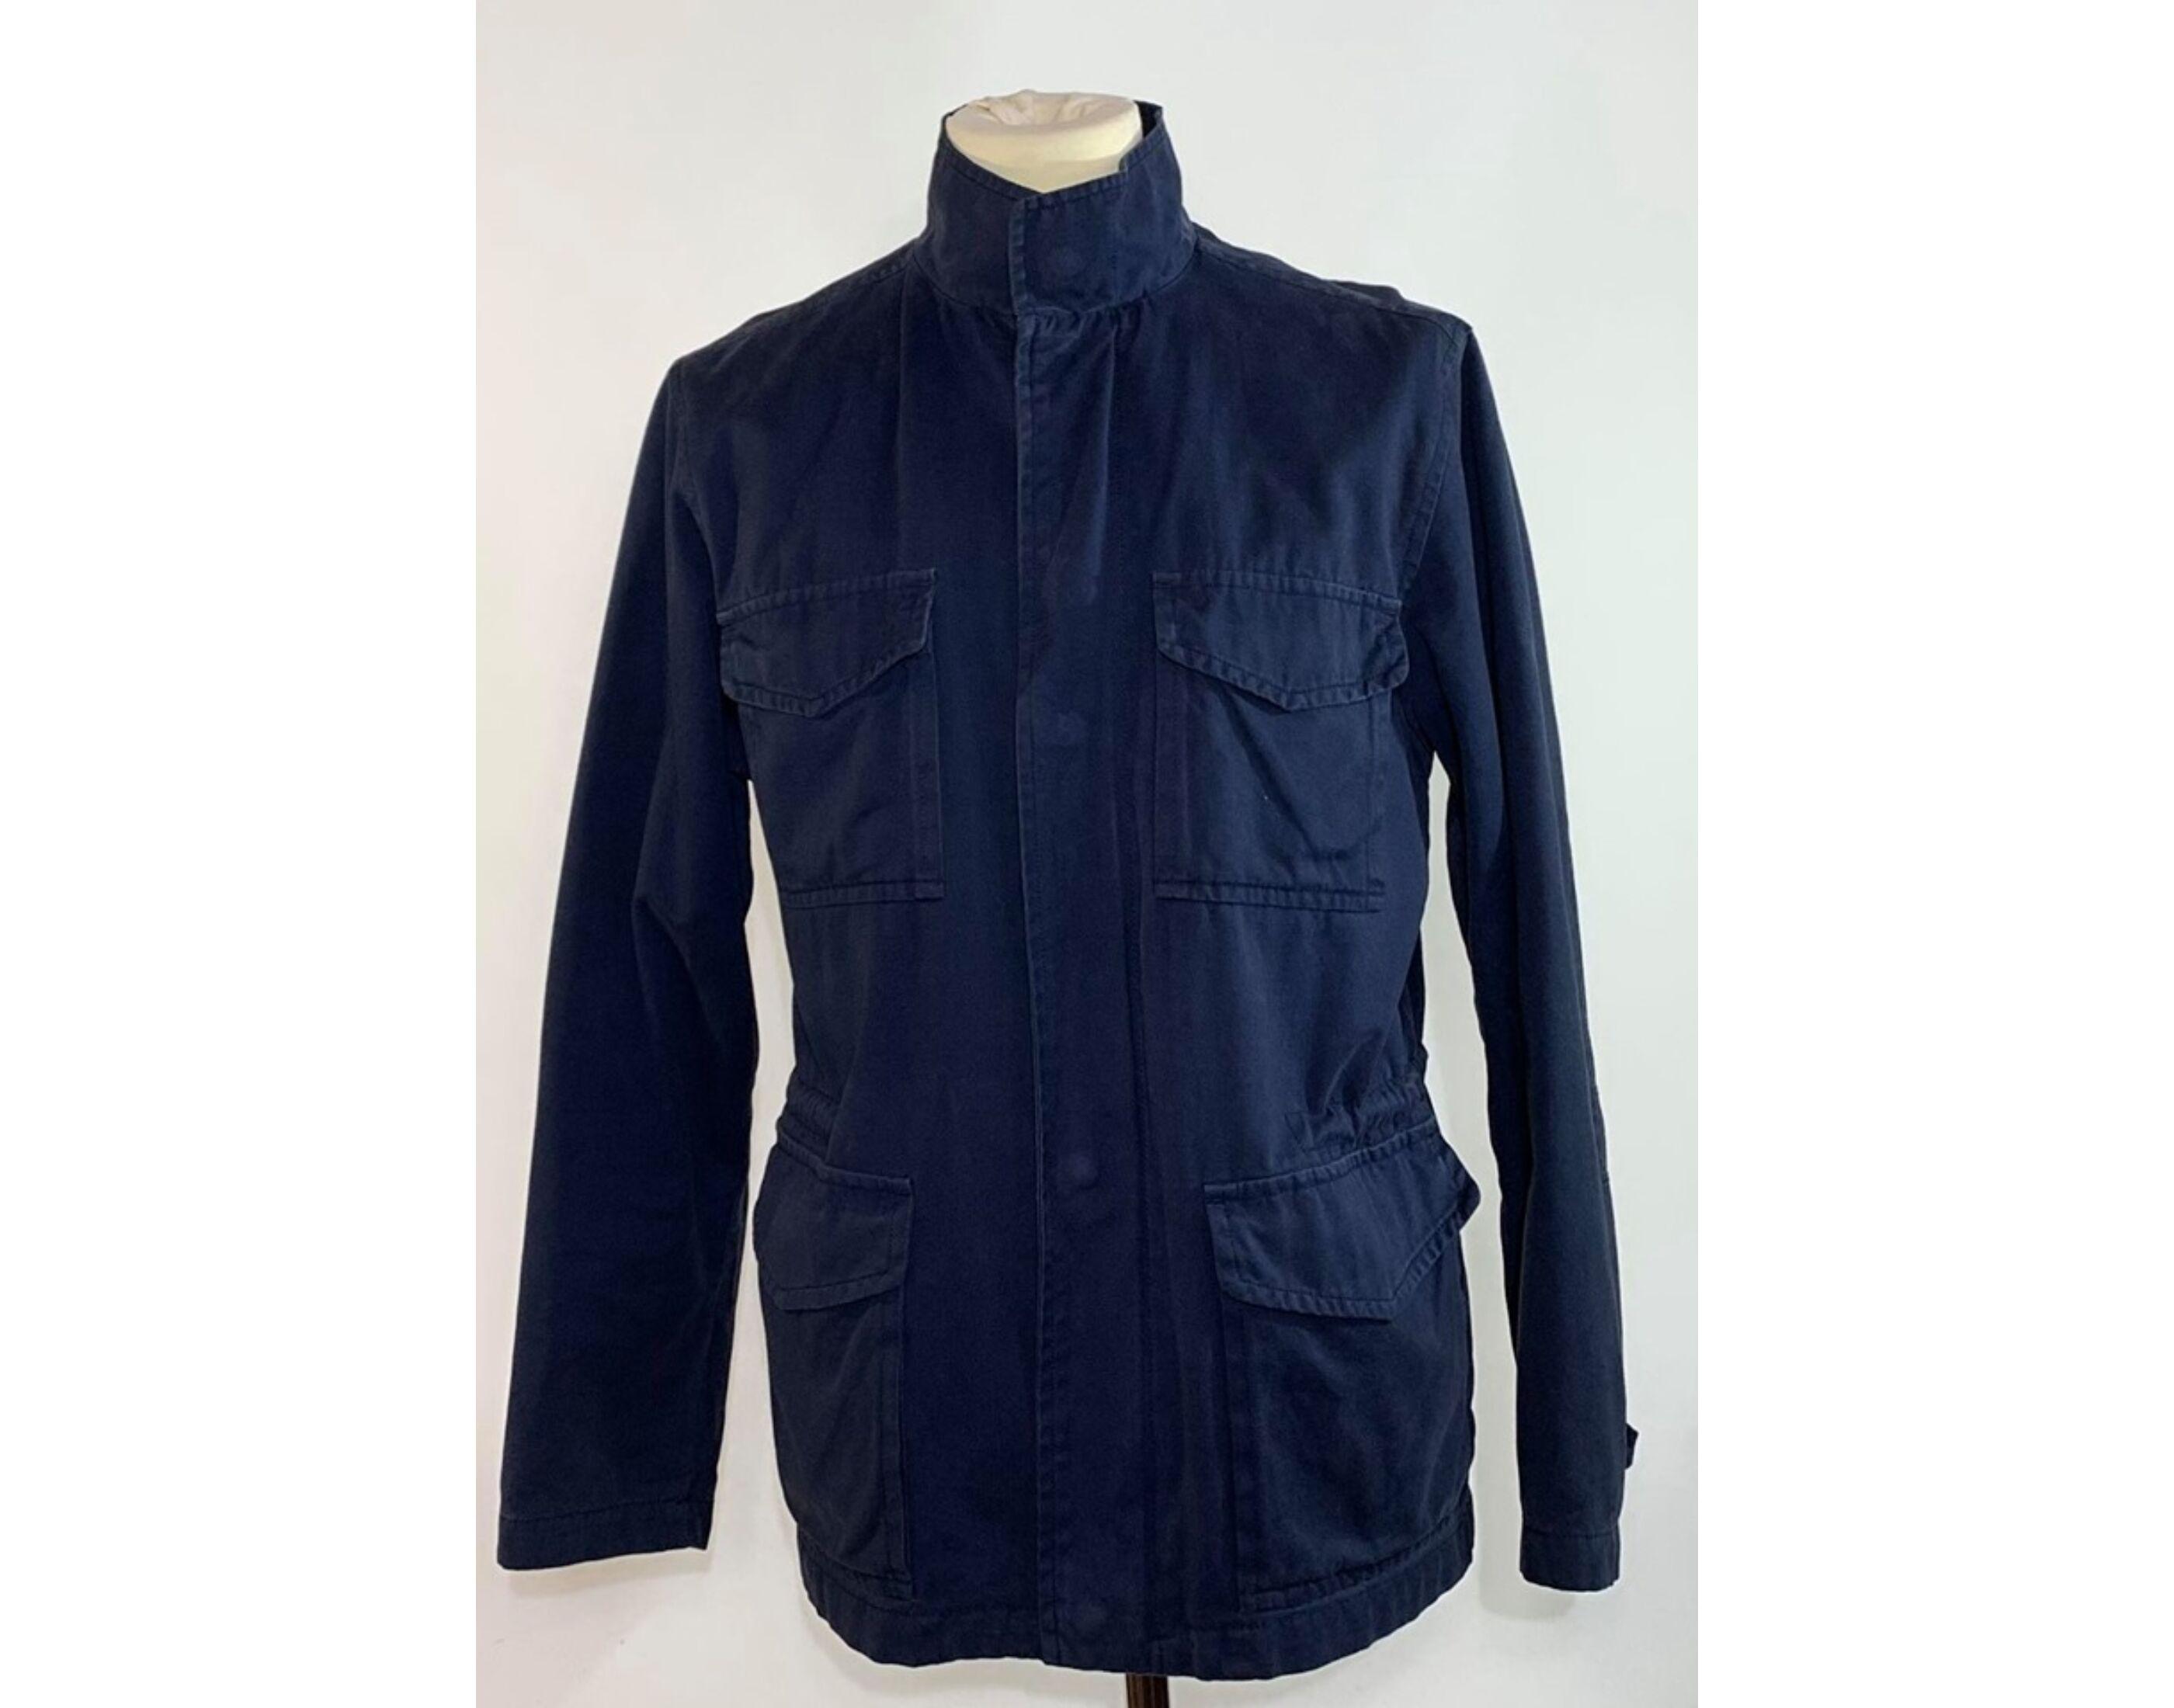 Linea kabát (S)